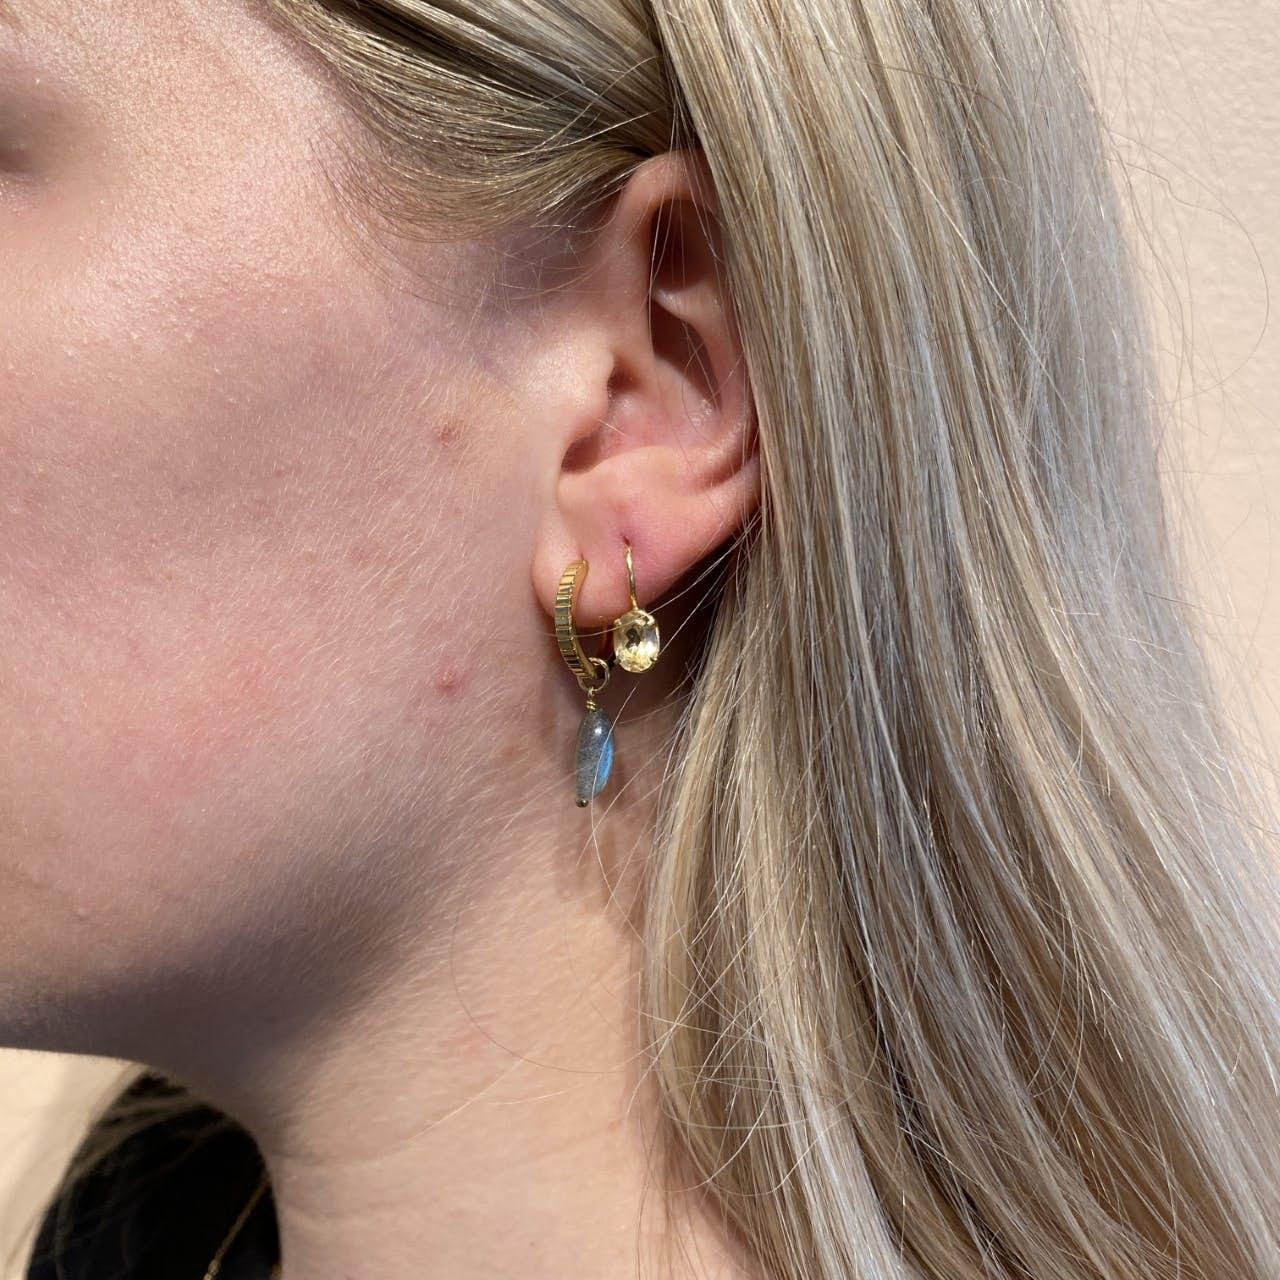 Archieve Earring Confidence fra Carré i Forgylt-Sølv Sterling 925